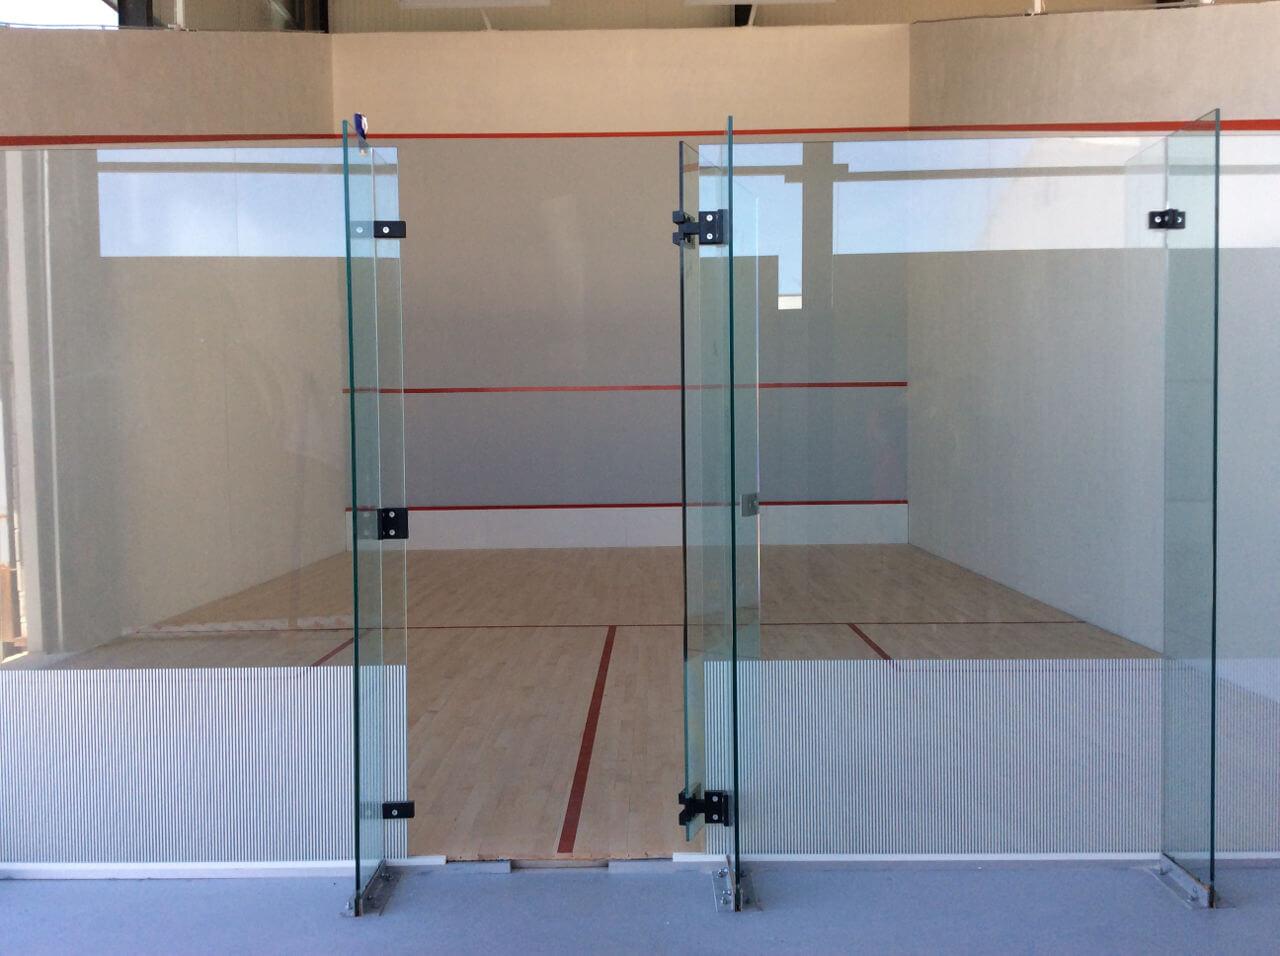 fabrication de terrain de squash